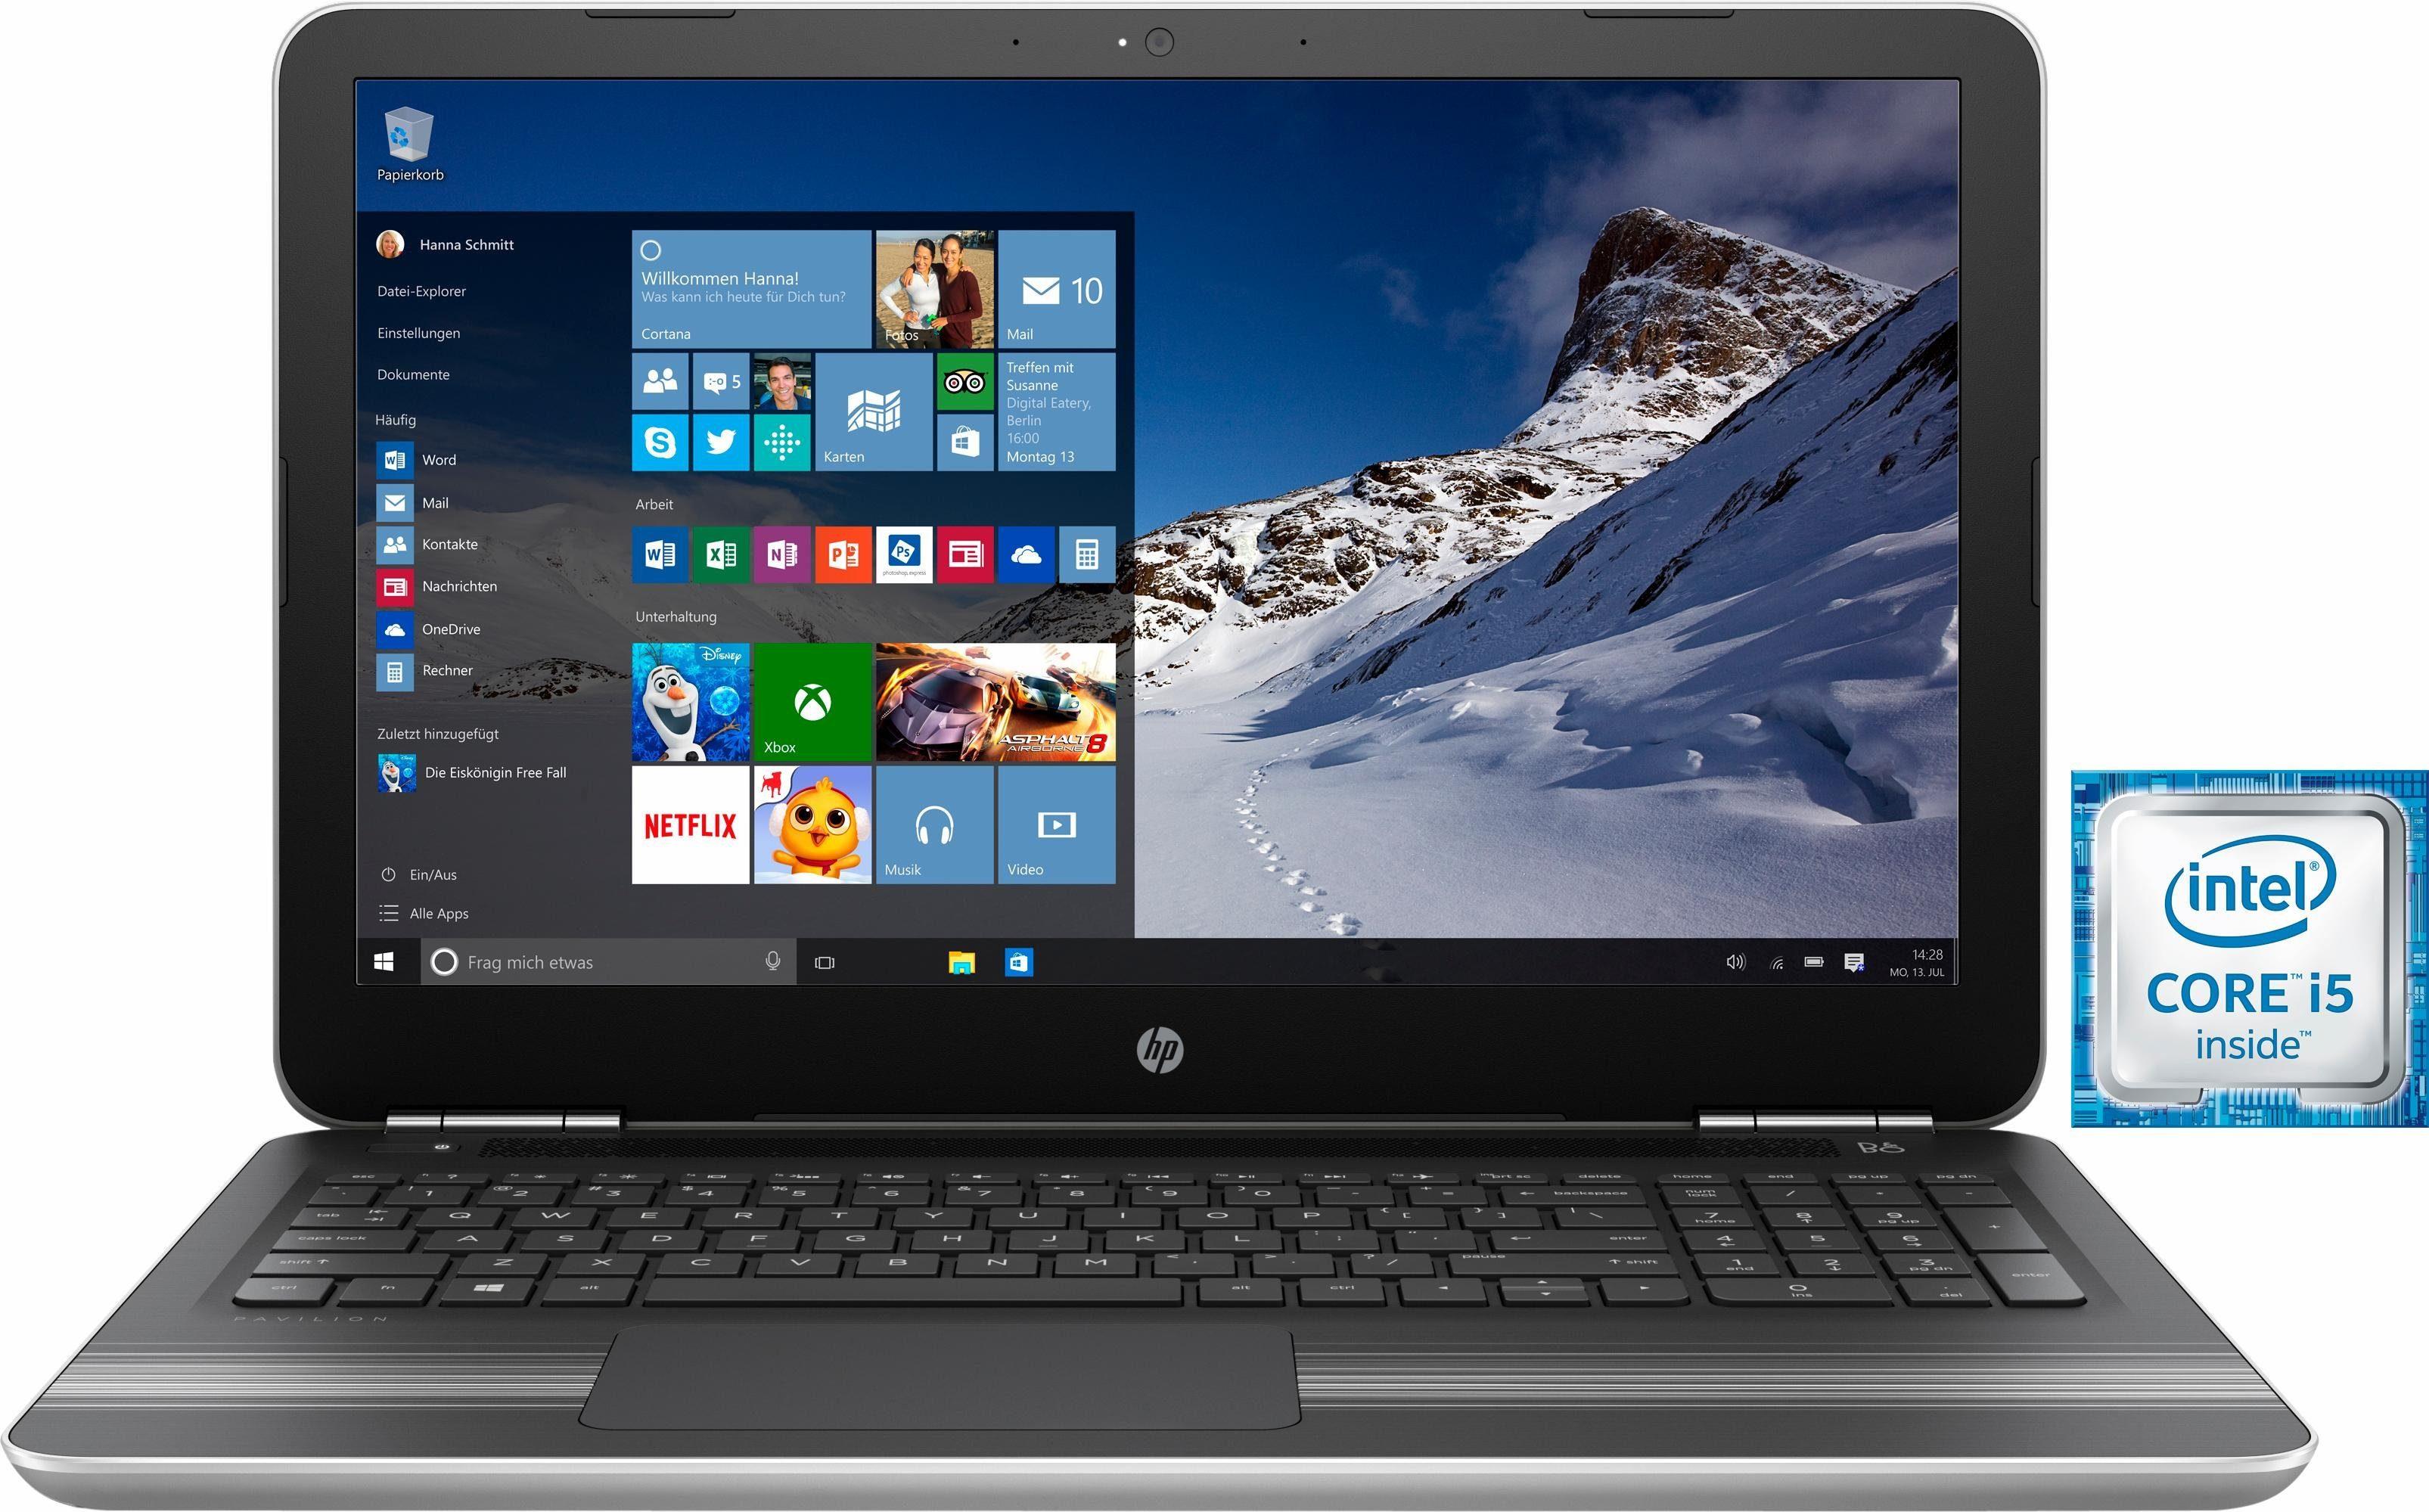 HP Pavilion 15-au010ng Notebook, Intel® Core™ i5, 39,6 cm (15,6 Zoll), 1128 GB Speicher